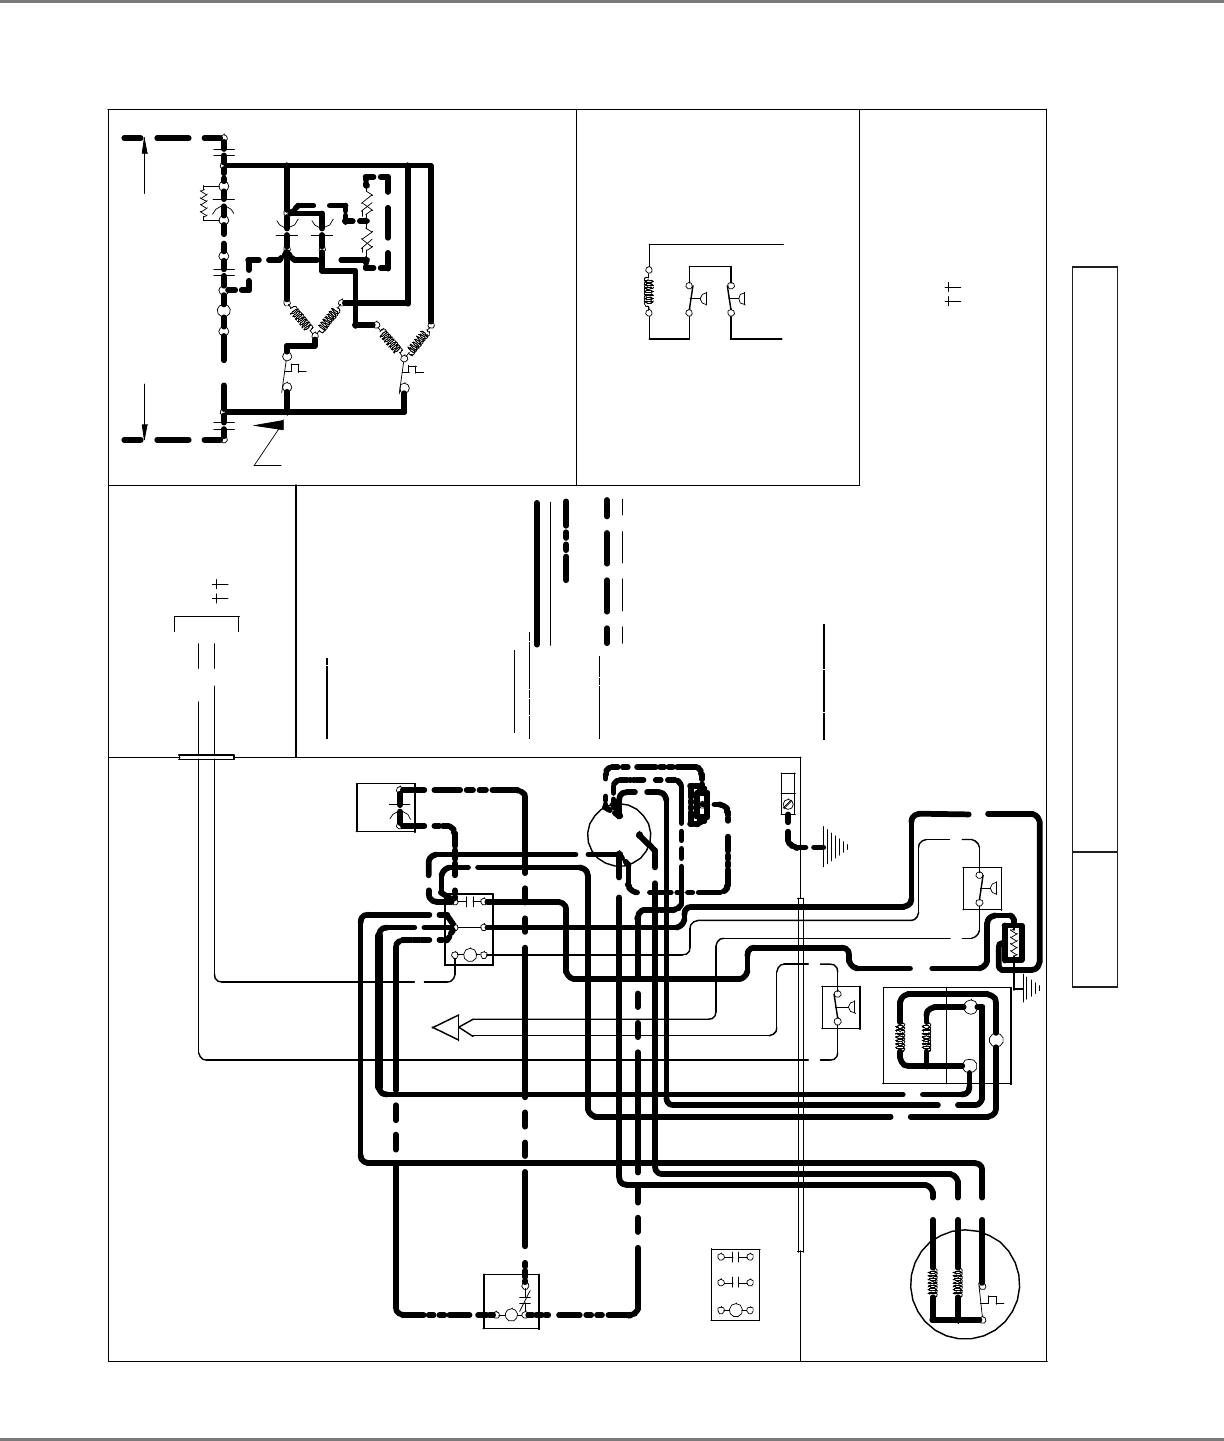 [ZTBE_9966]  Goodman Mfg goodman High-Efficiency, 2- to 5-Ton Split System Air  Conditioner, SS-SSX16 LABEL, WIRING DIAGRAM | Wiring Diagram Goodman Manufacturing Company |  | Manuals